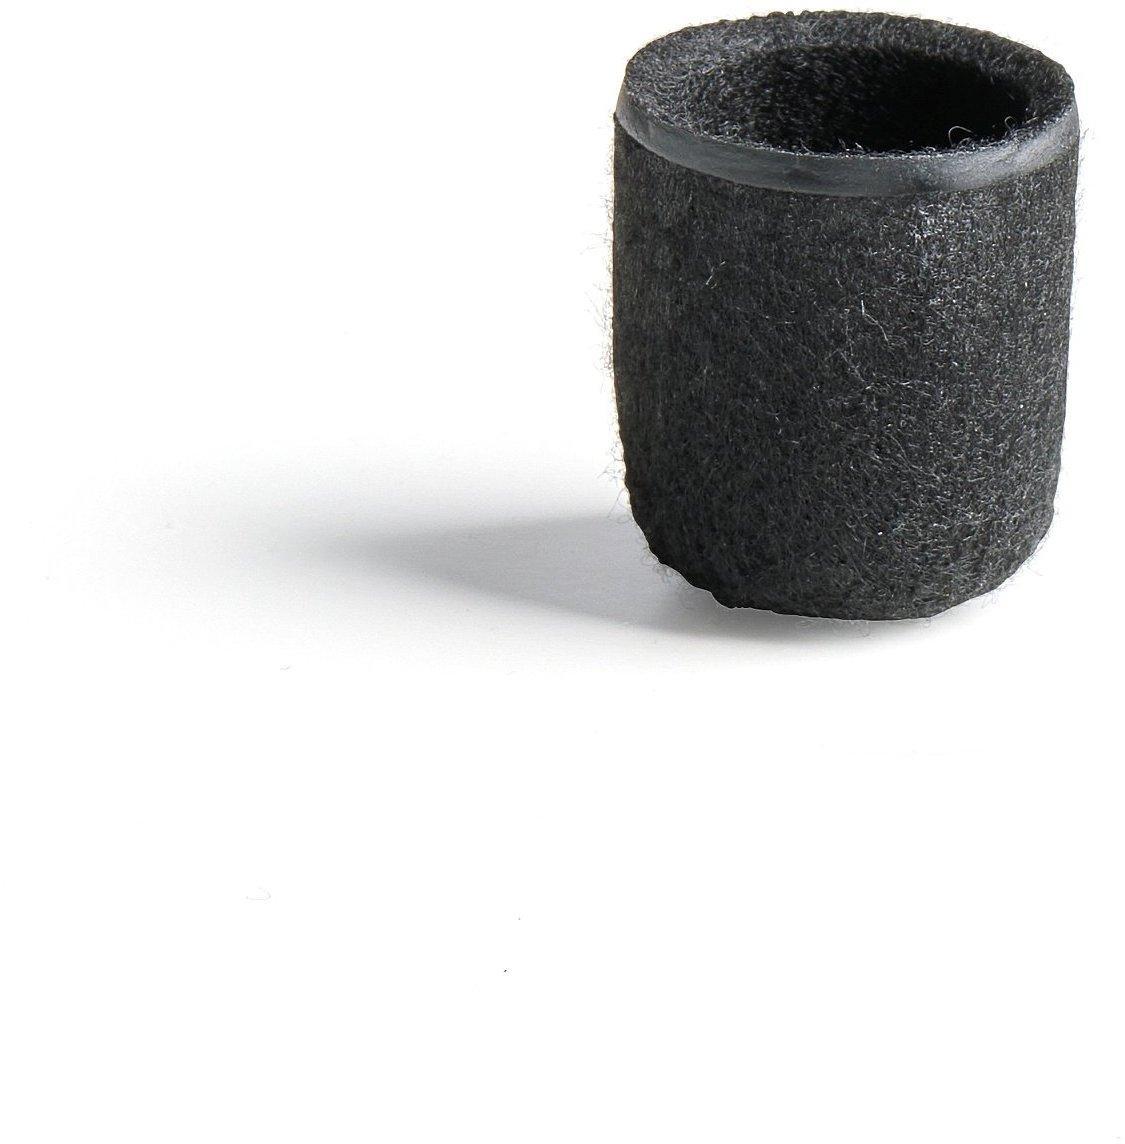 Plstená nožička, Ø 22 mm, čierna